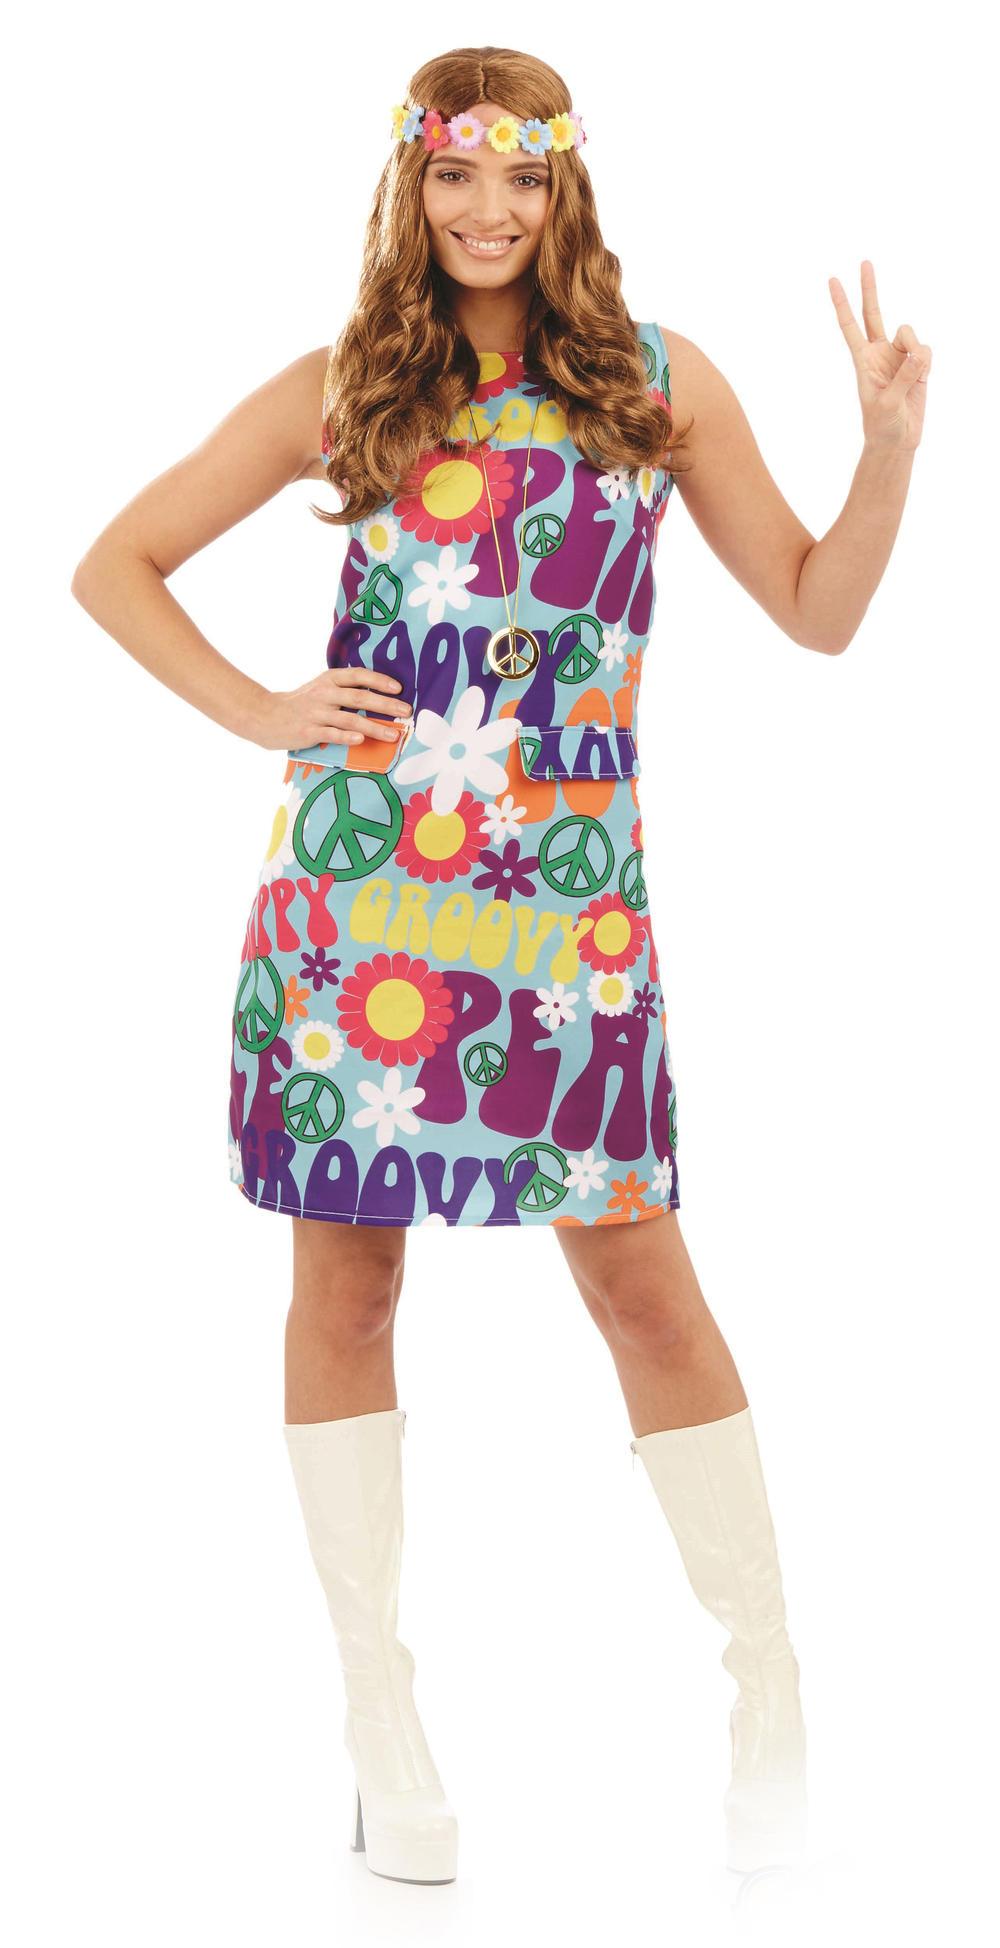 Groovy Hippie Ladies Fancy Dress 1970s 70s Peace Hippy Womens Adults Costume New